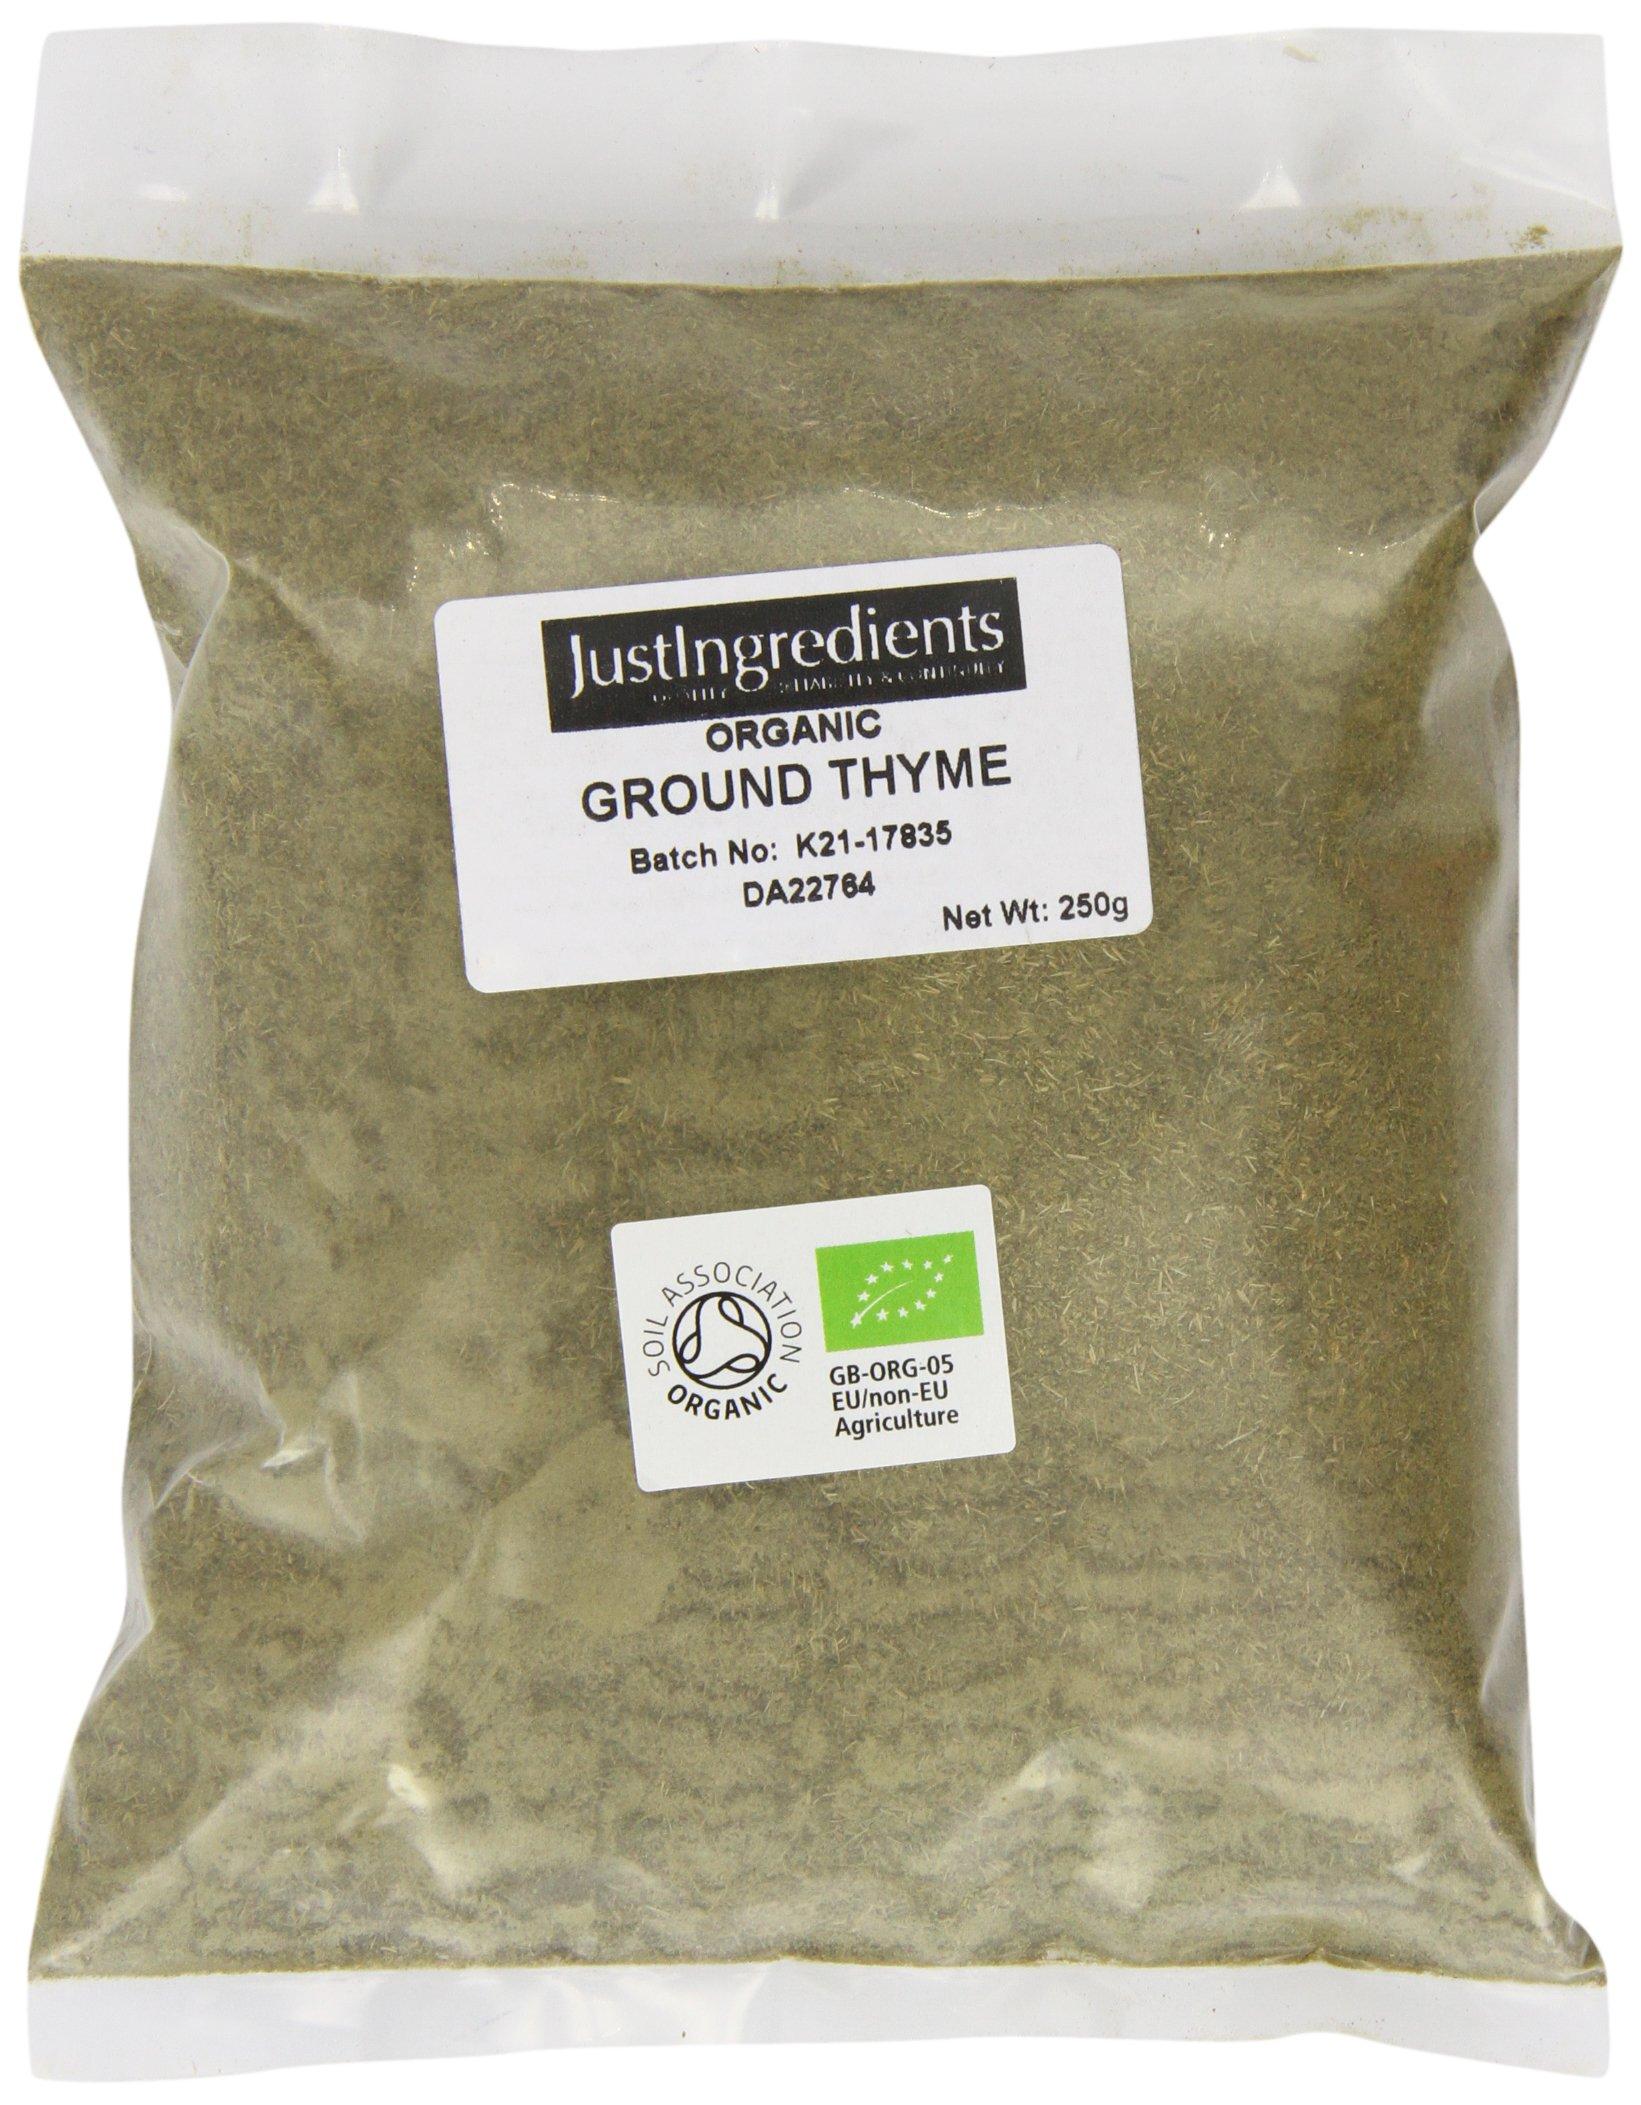 JustIngredients Organic Thyme Ground Loose 250 g (Pack of 2)